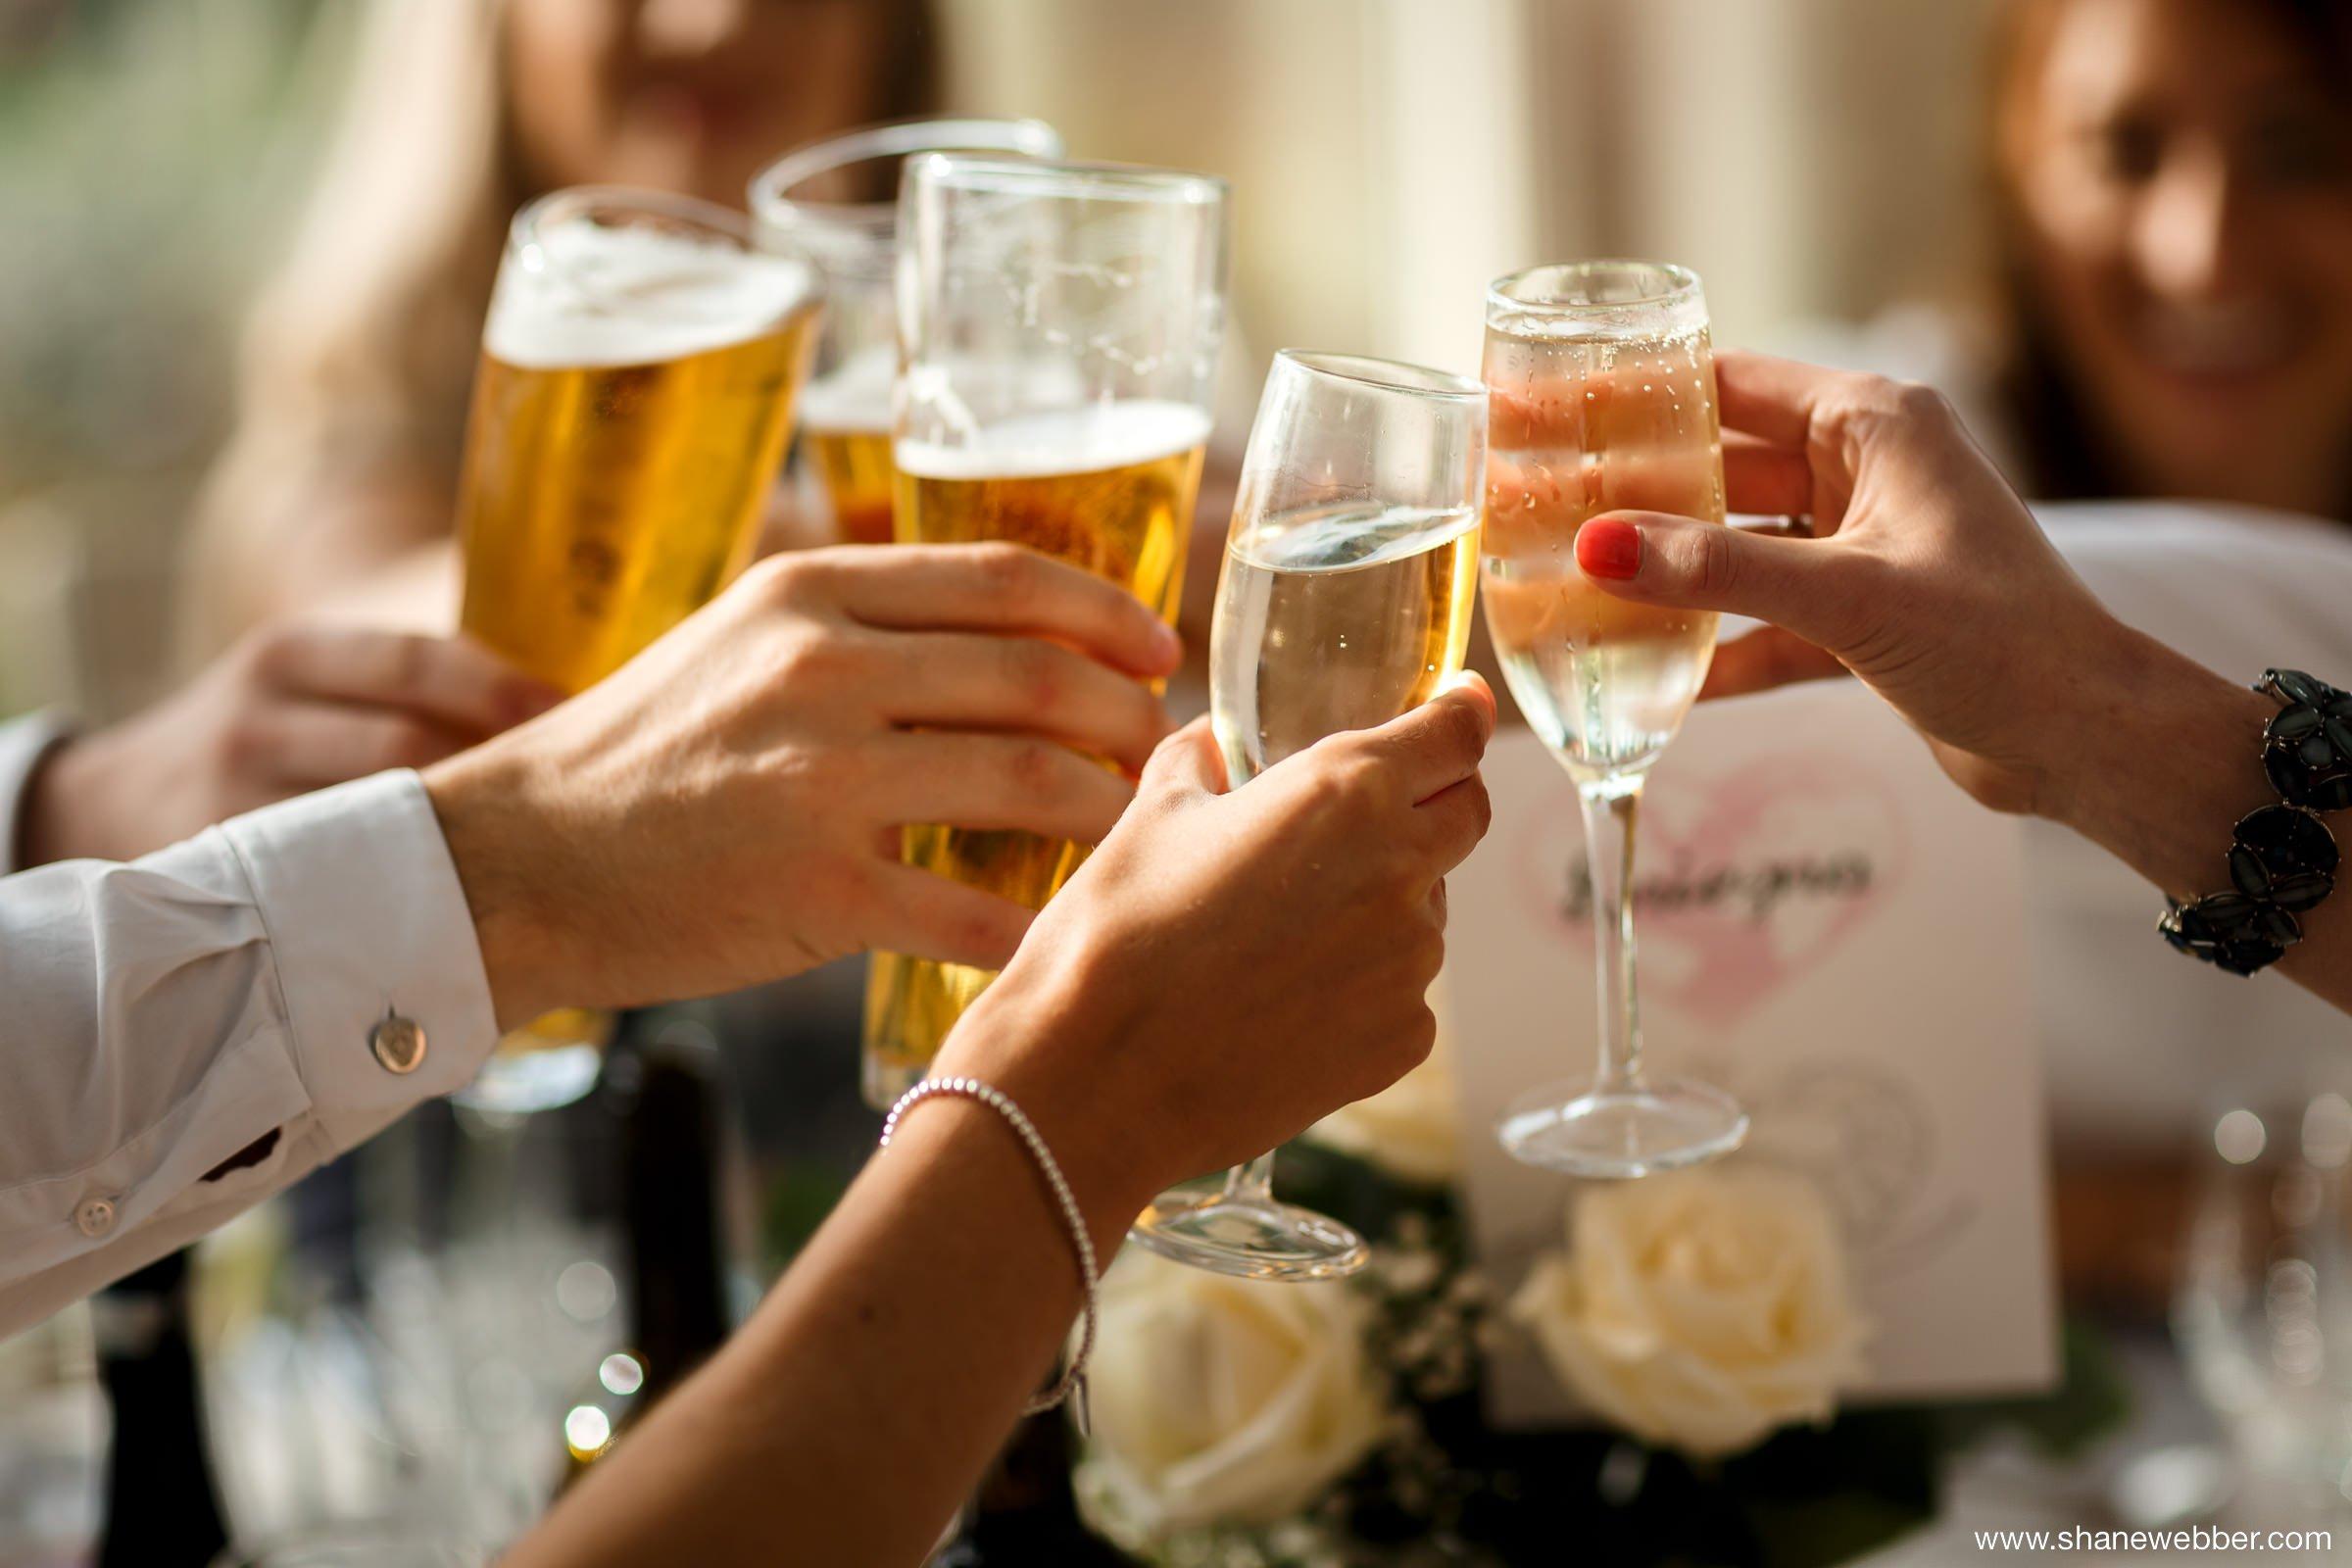 Guests celebrating